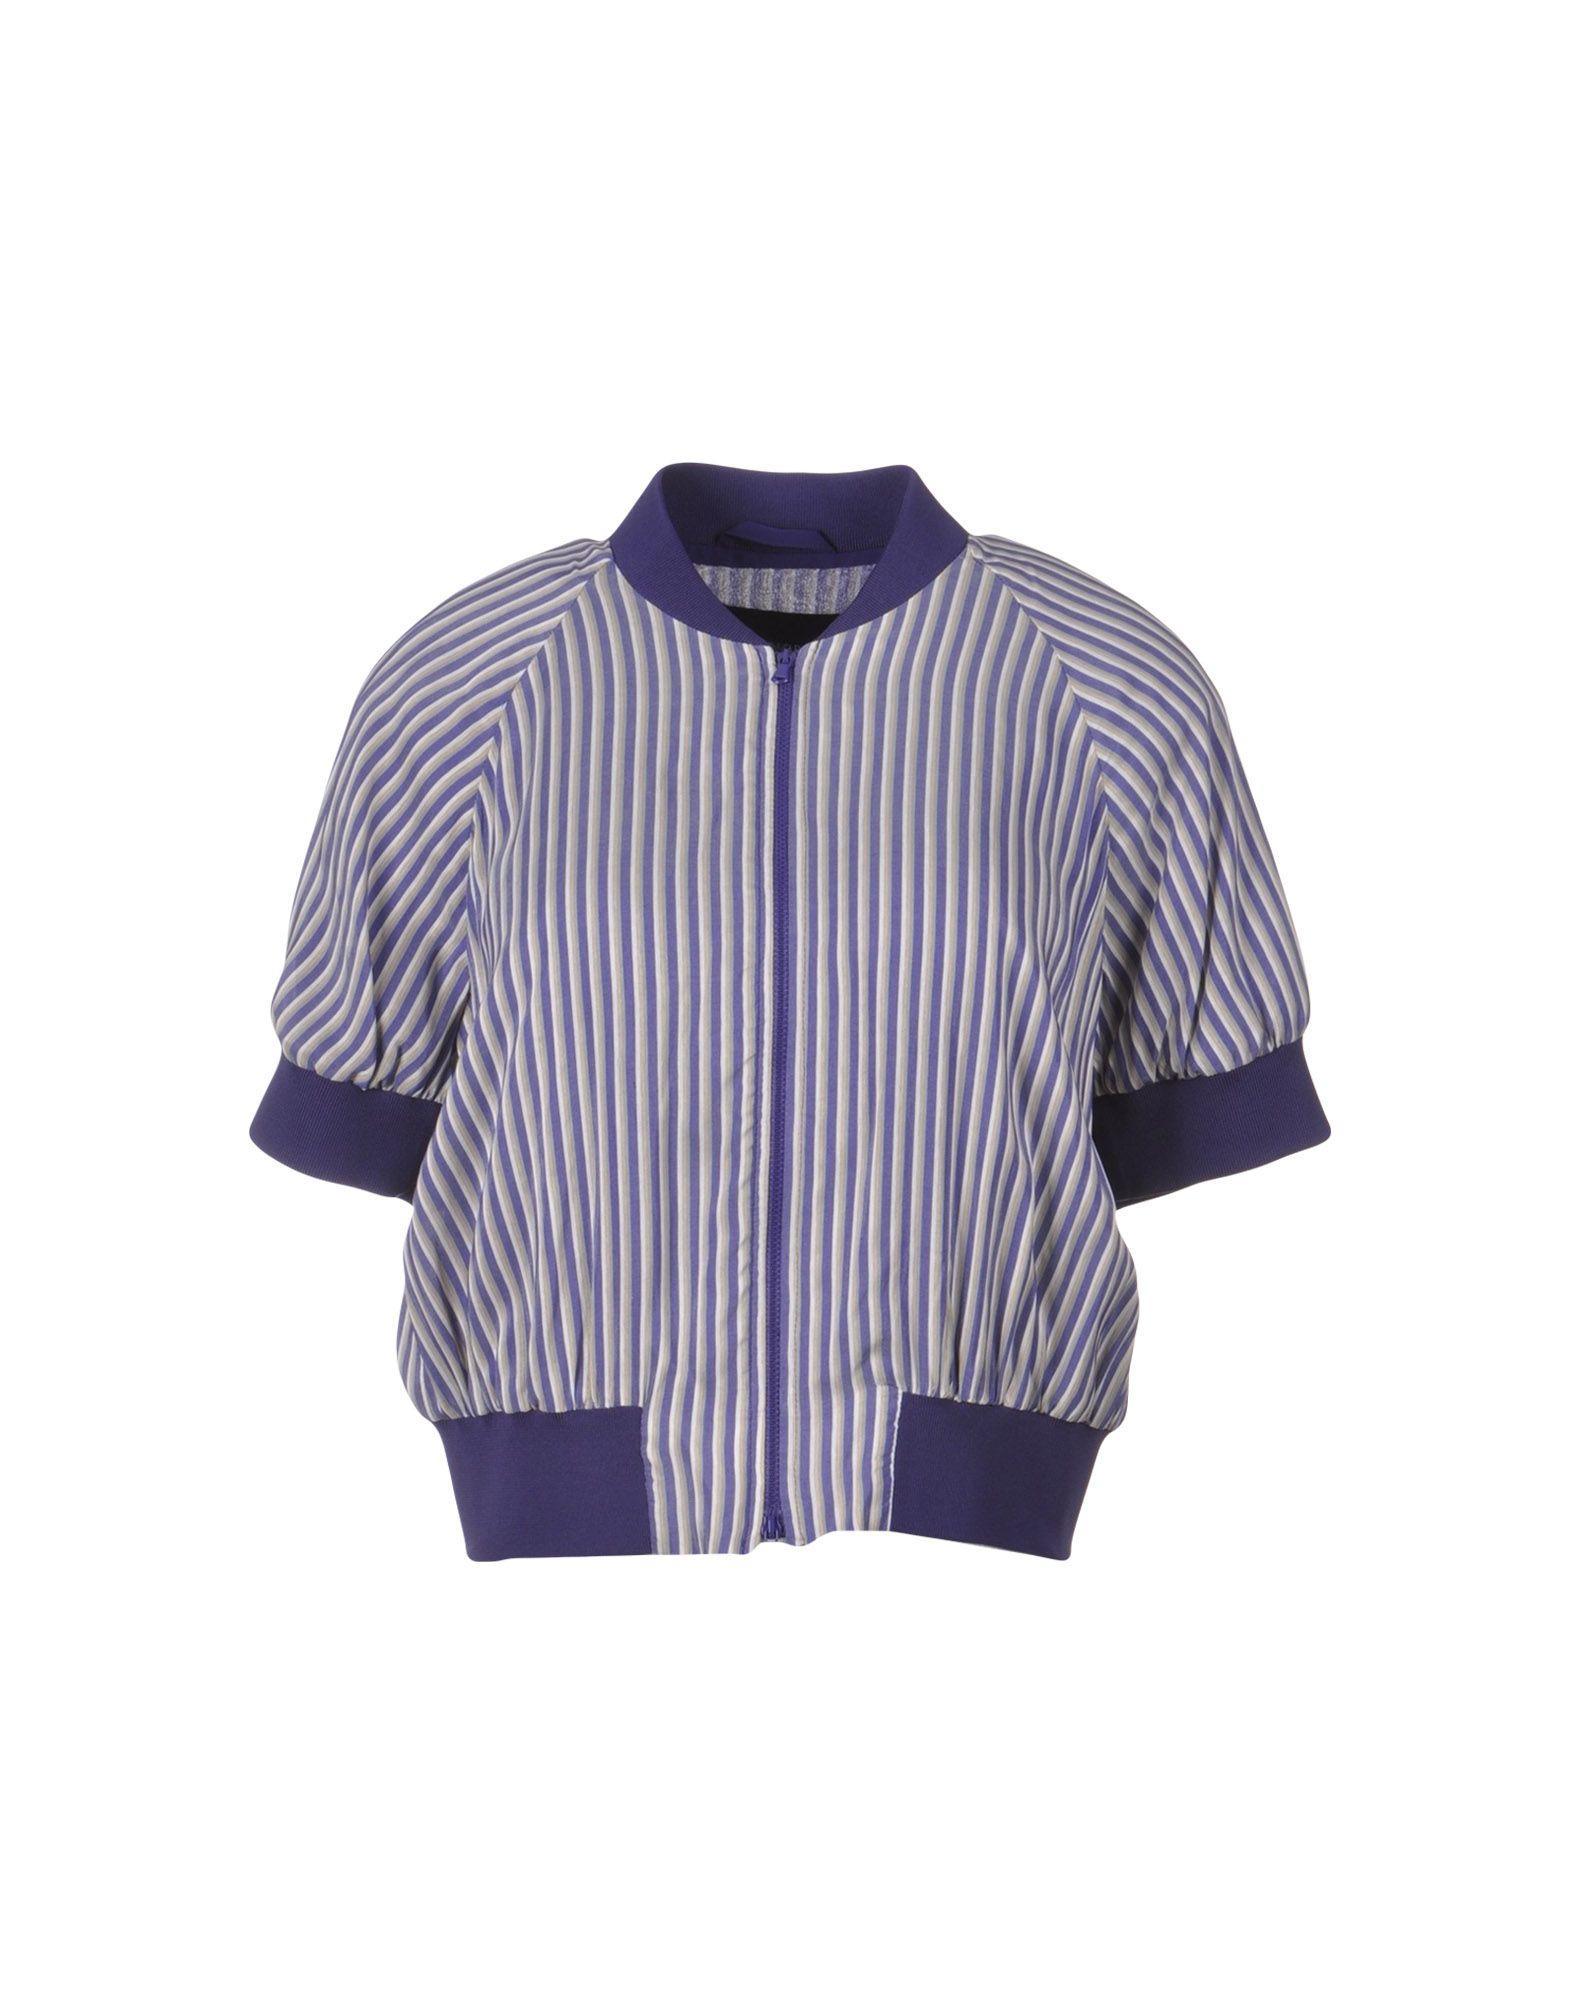 Emporio Armani Jackets In Purple